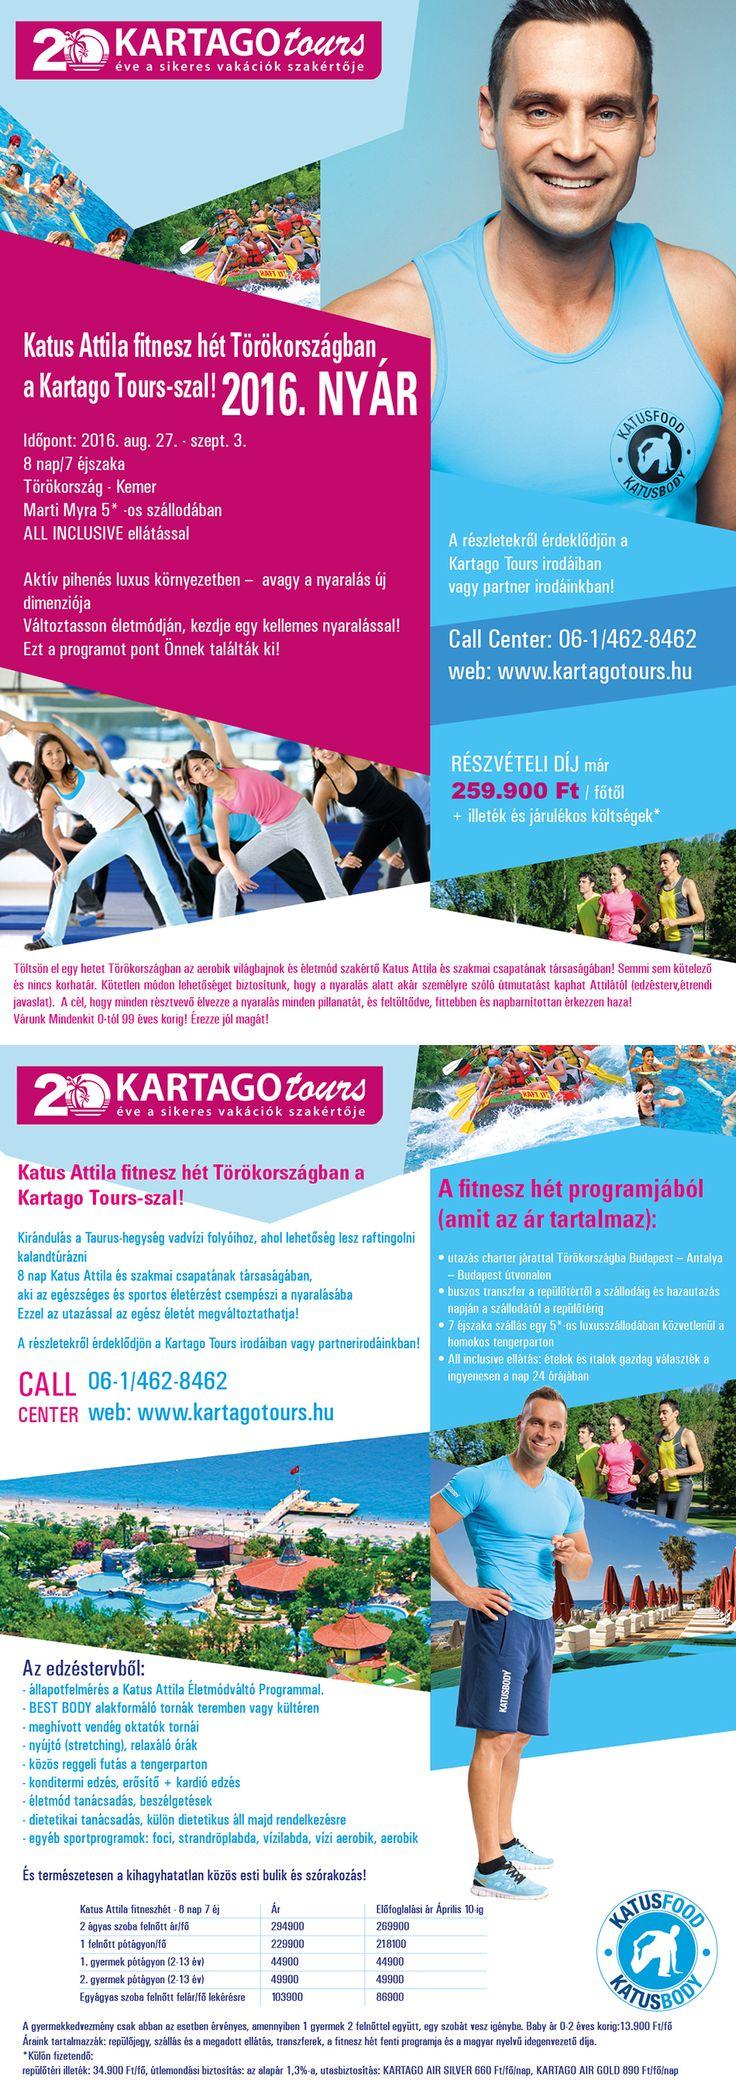 Kartago Tours - KATUS ATTILA Fitneszhét